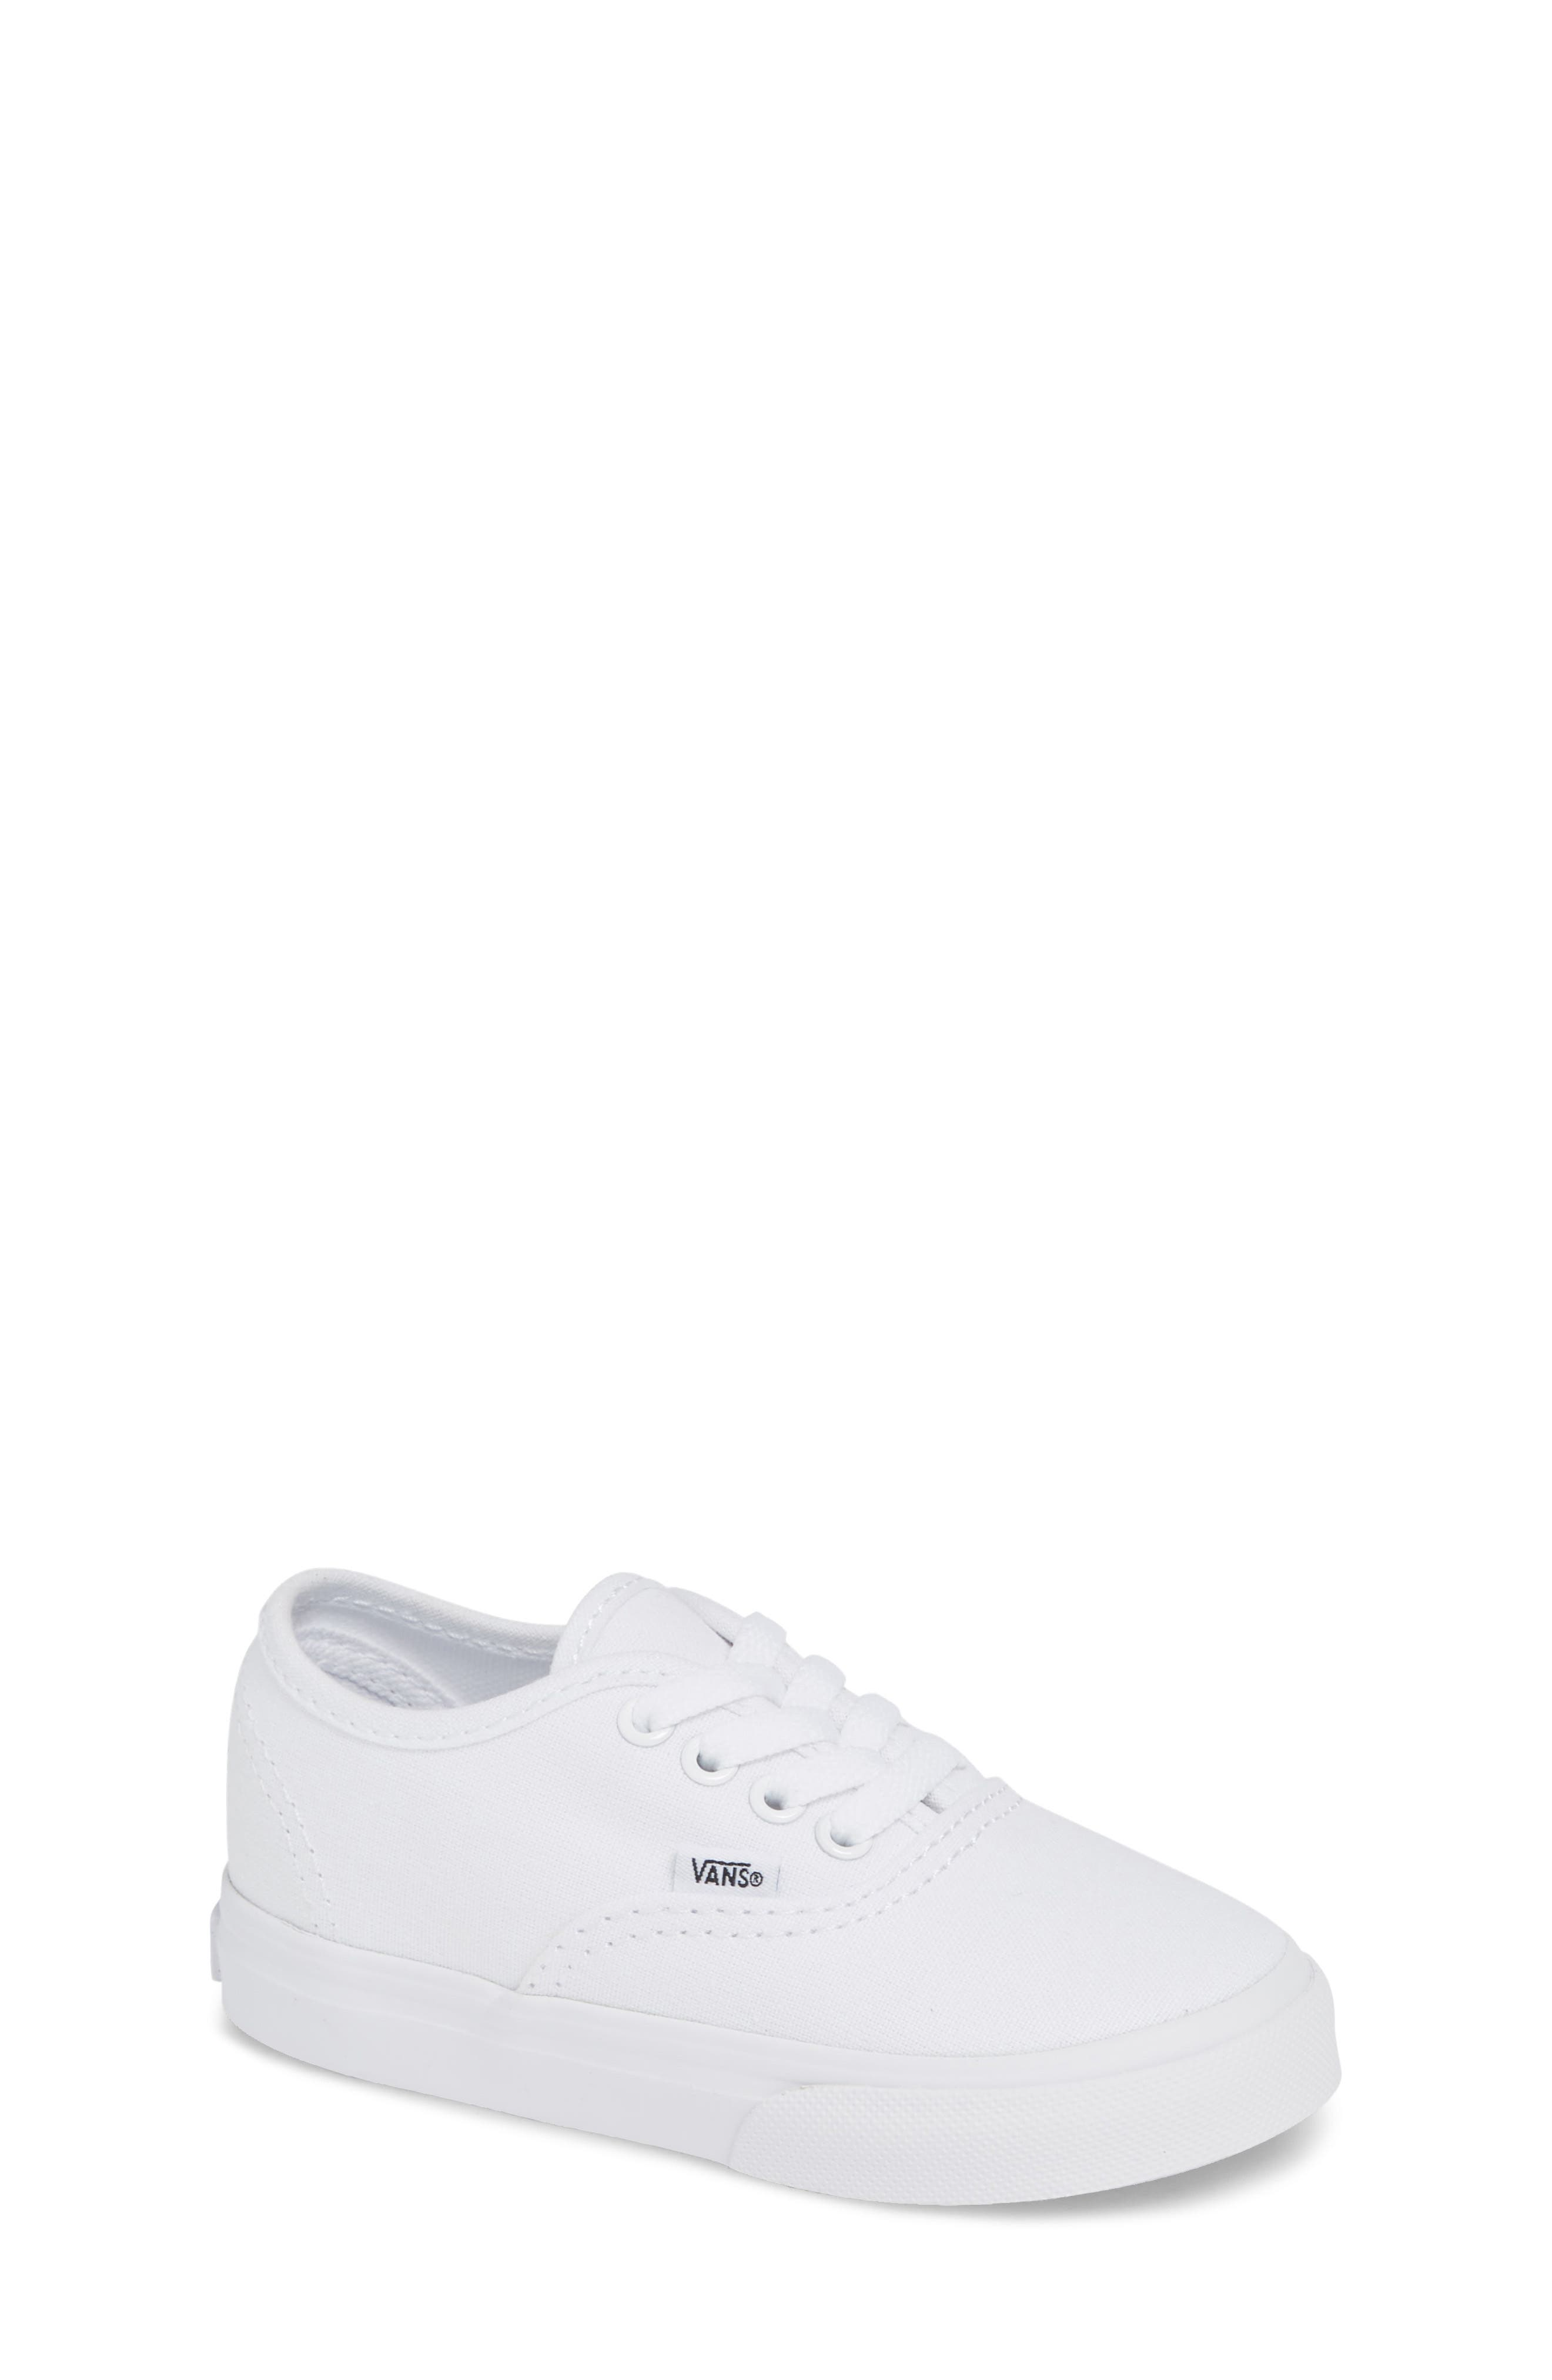 VANS 'Authentic' Sneaker, Main, color, TRUE WHITE/ WHITE